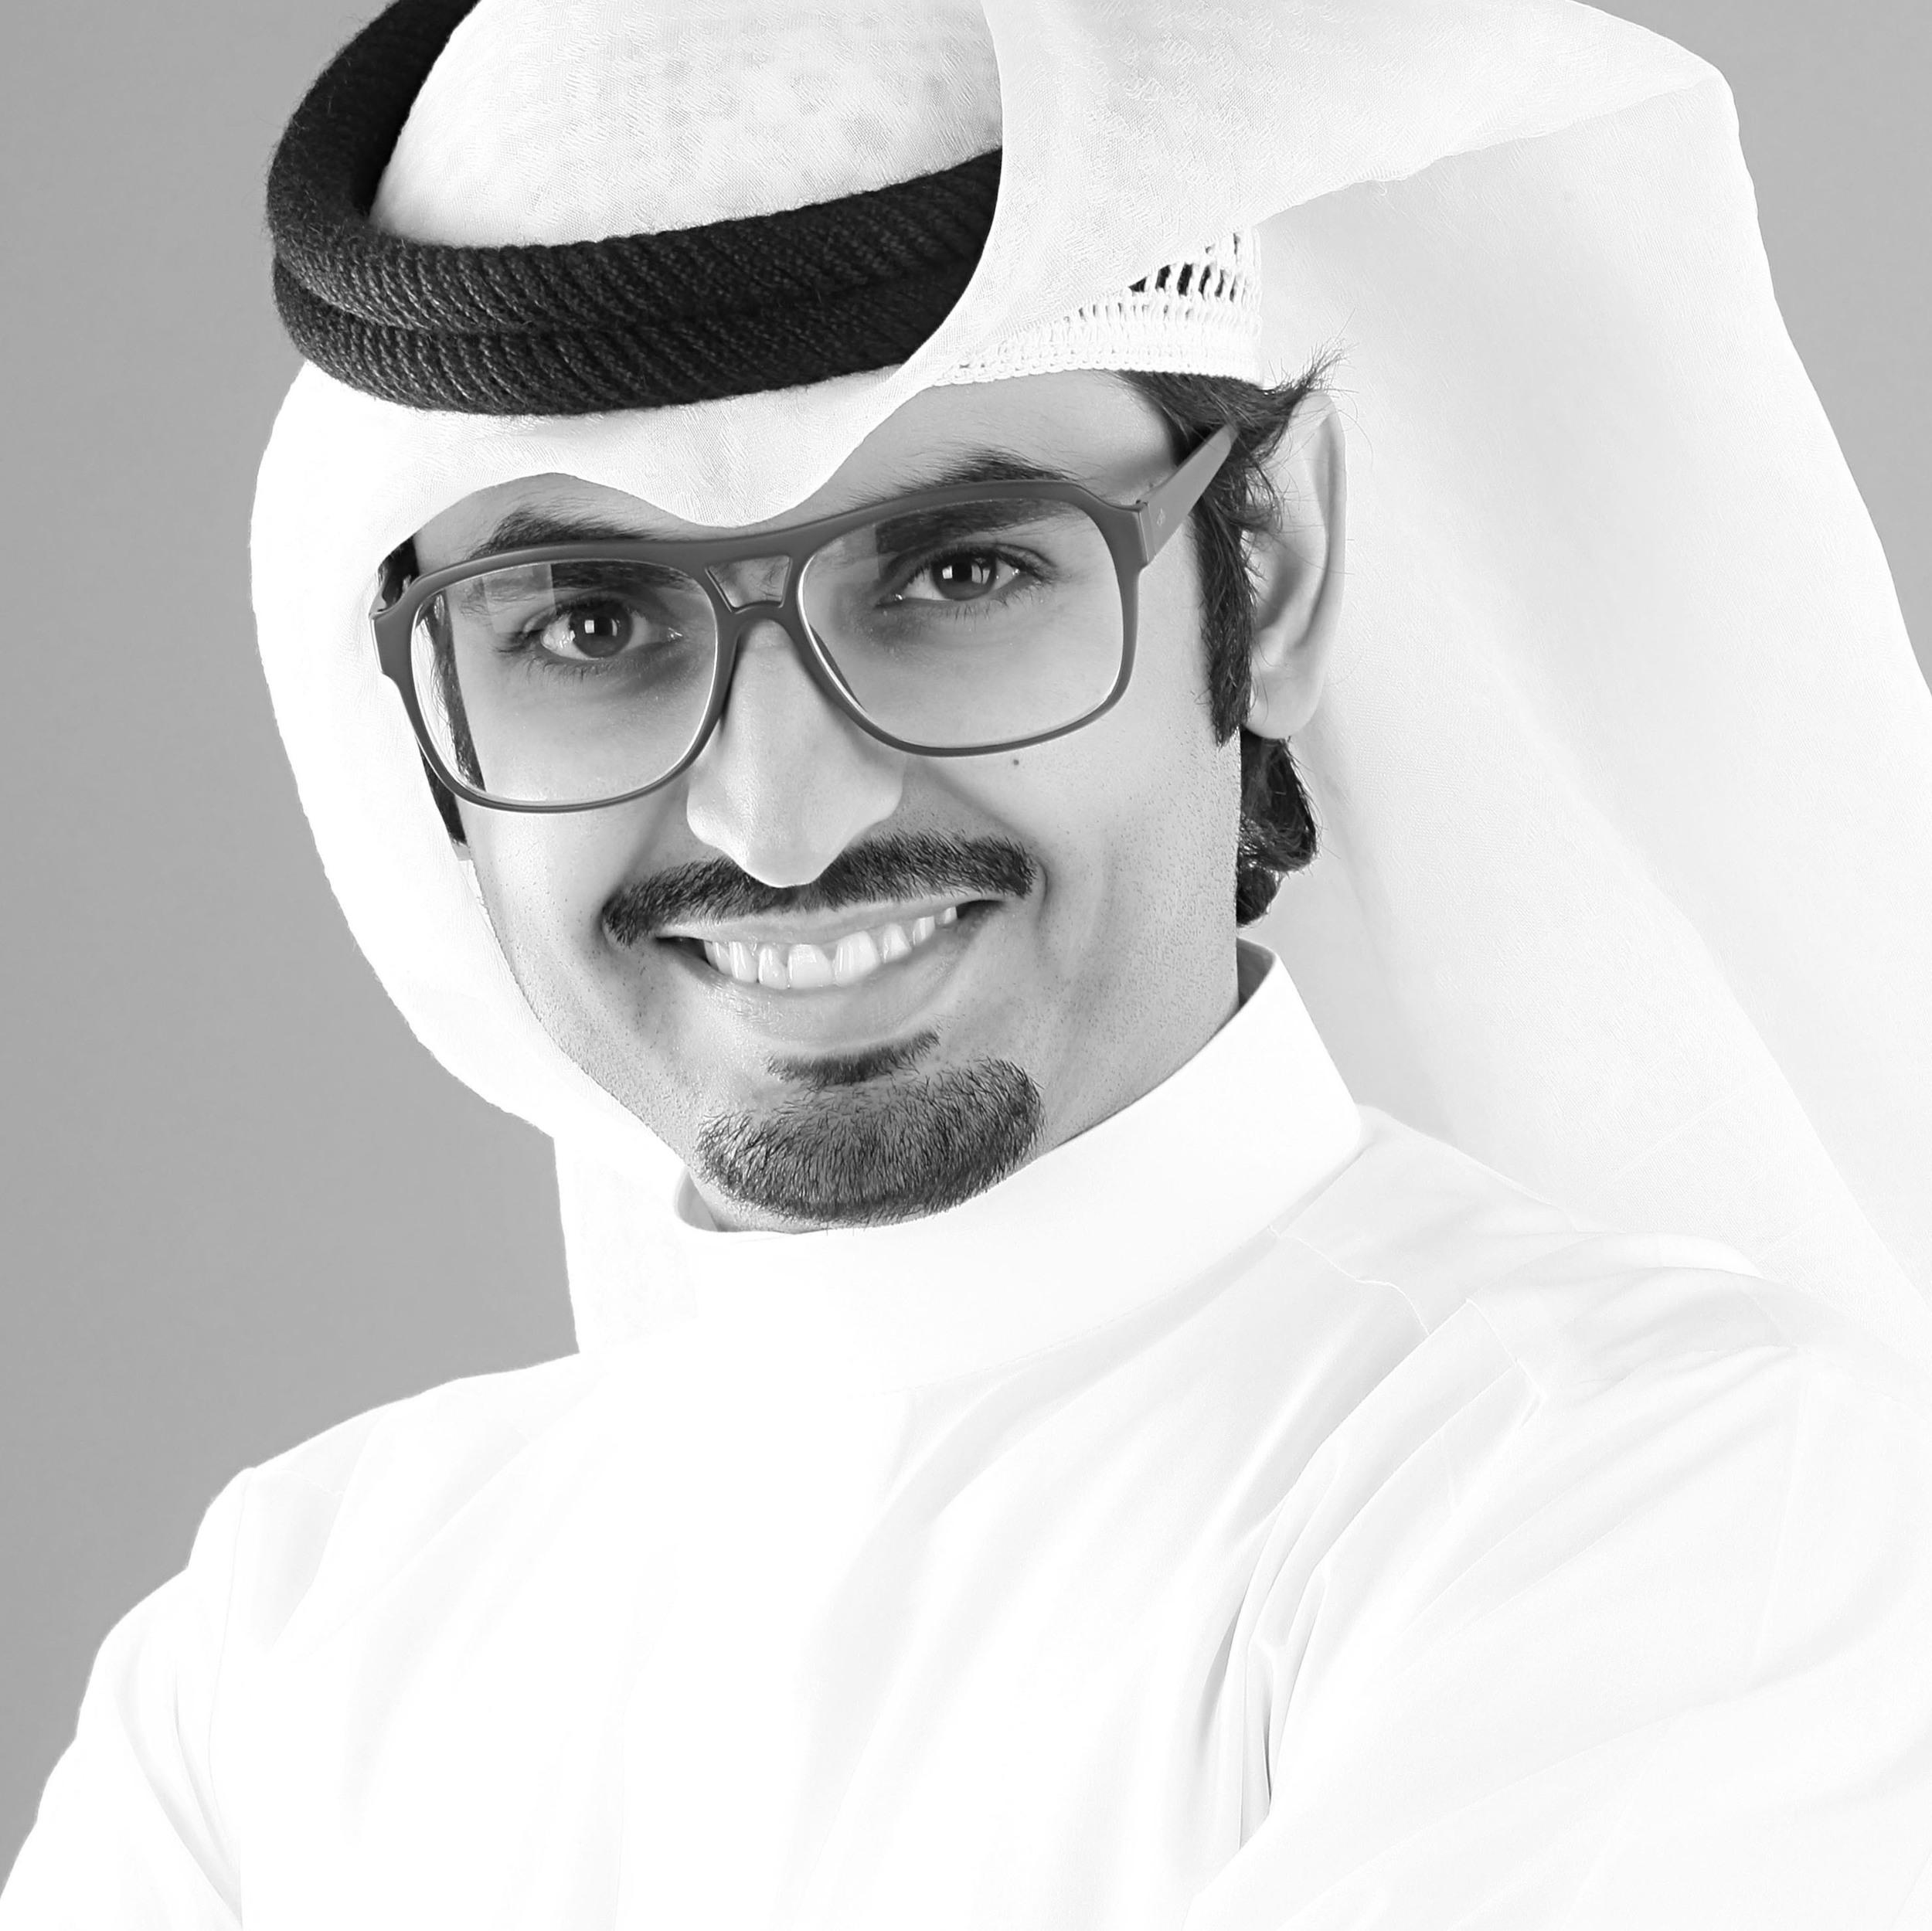 Host: Abdullah Boftain